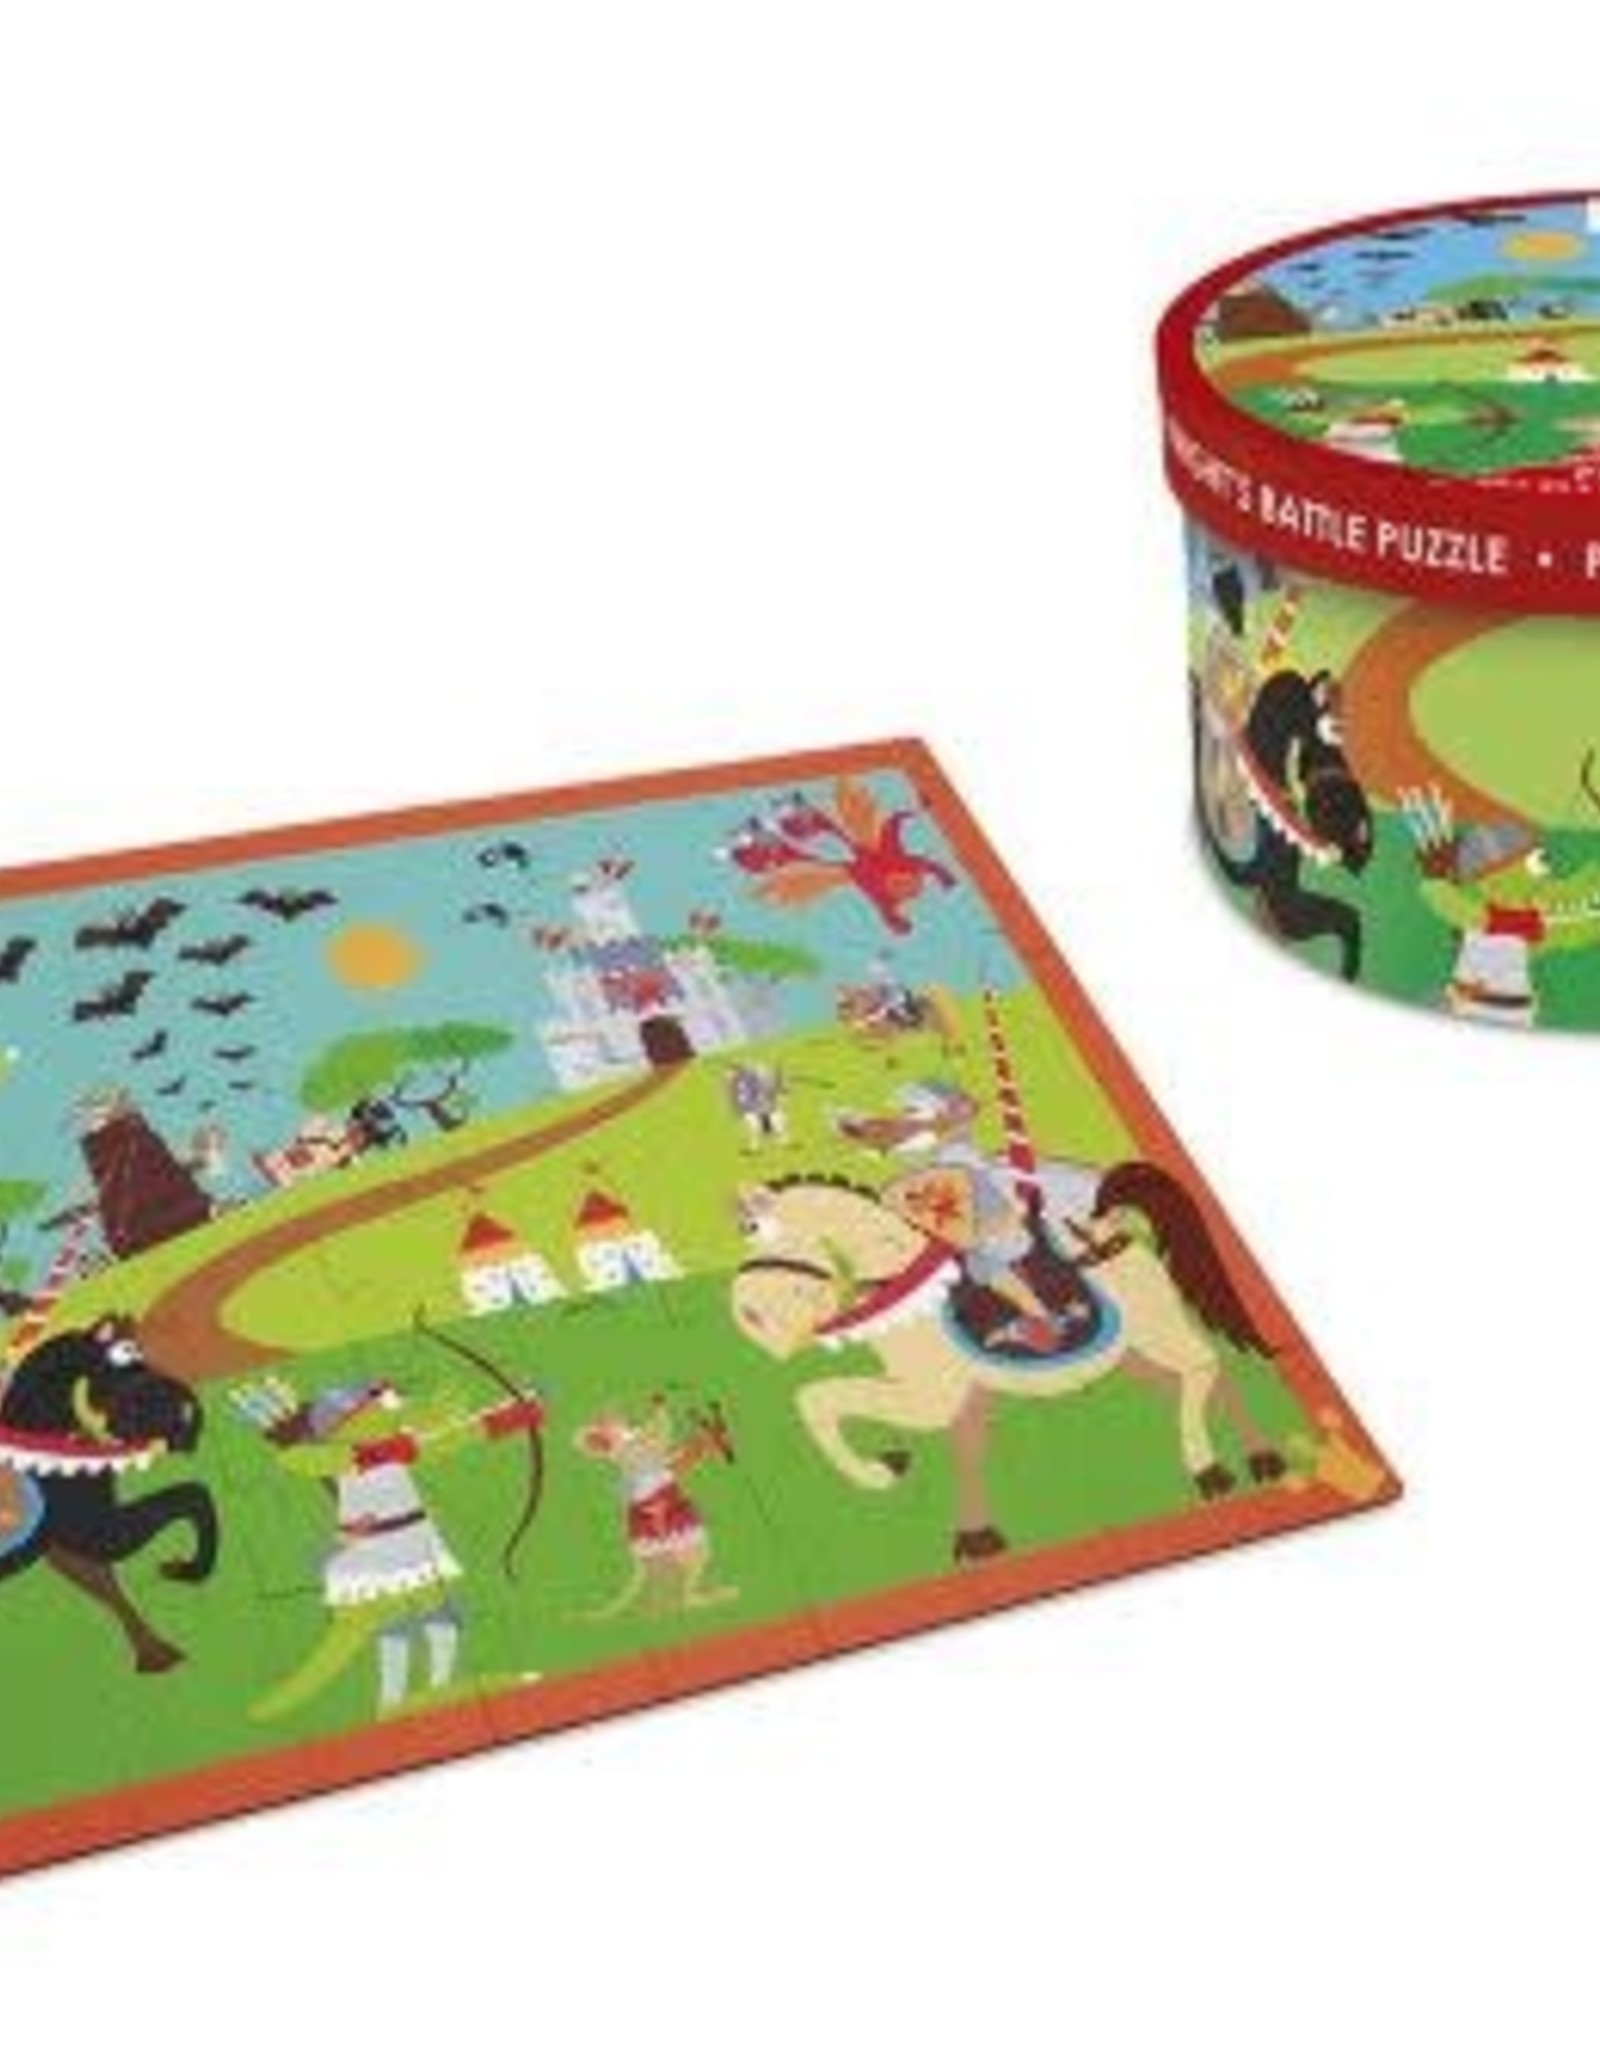 Dam Products Puzzle Knight Battle 60 pcs